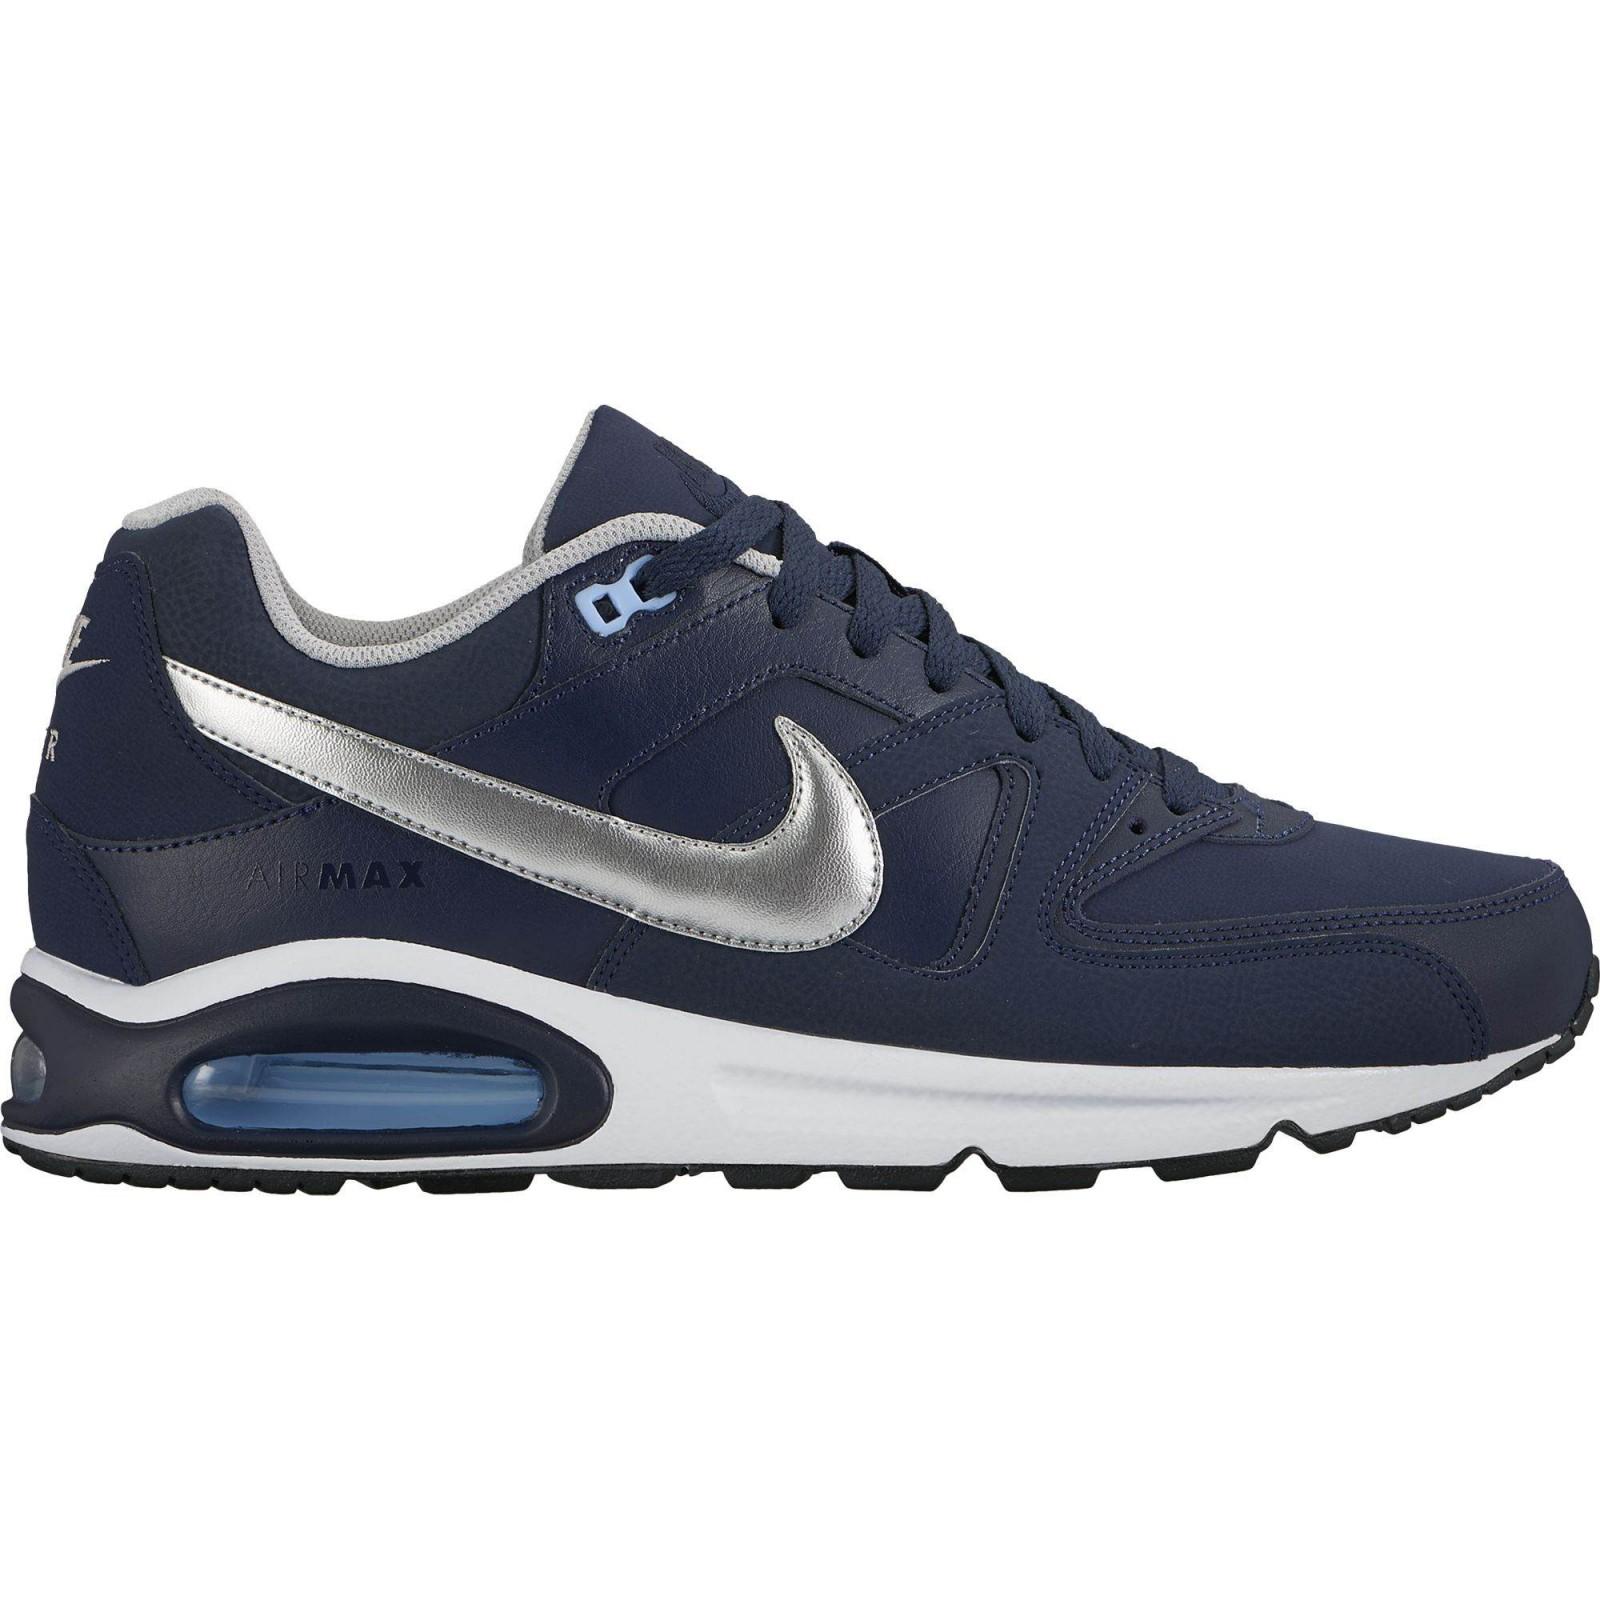 f7fa824c4cda4c Pánské tenisky Nike AIR MAX COMMAND LEATHER OBSIDIAN METALLIC SILVER-BLUECAP-WHITE.  1